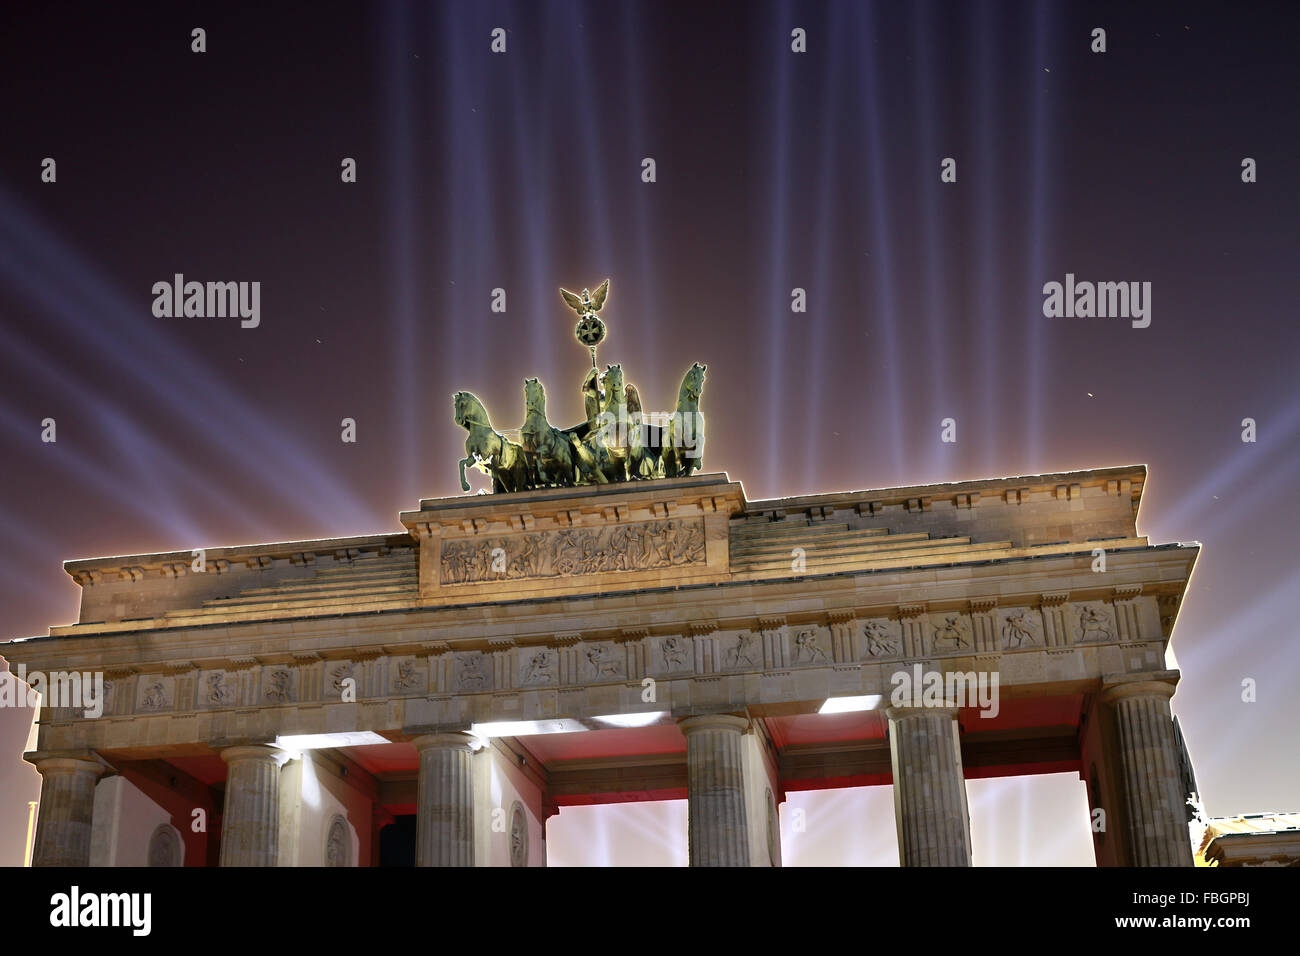 das illuminierte Brandenburger Tor, Berlin. - Stock Image